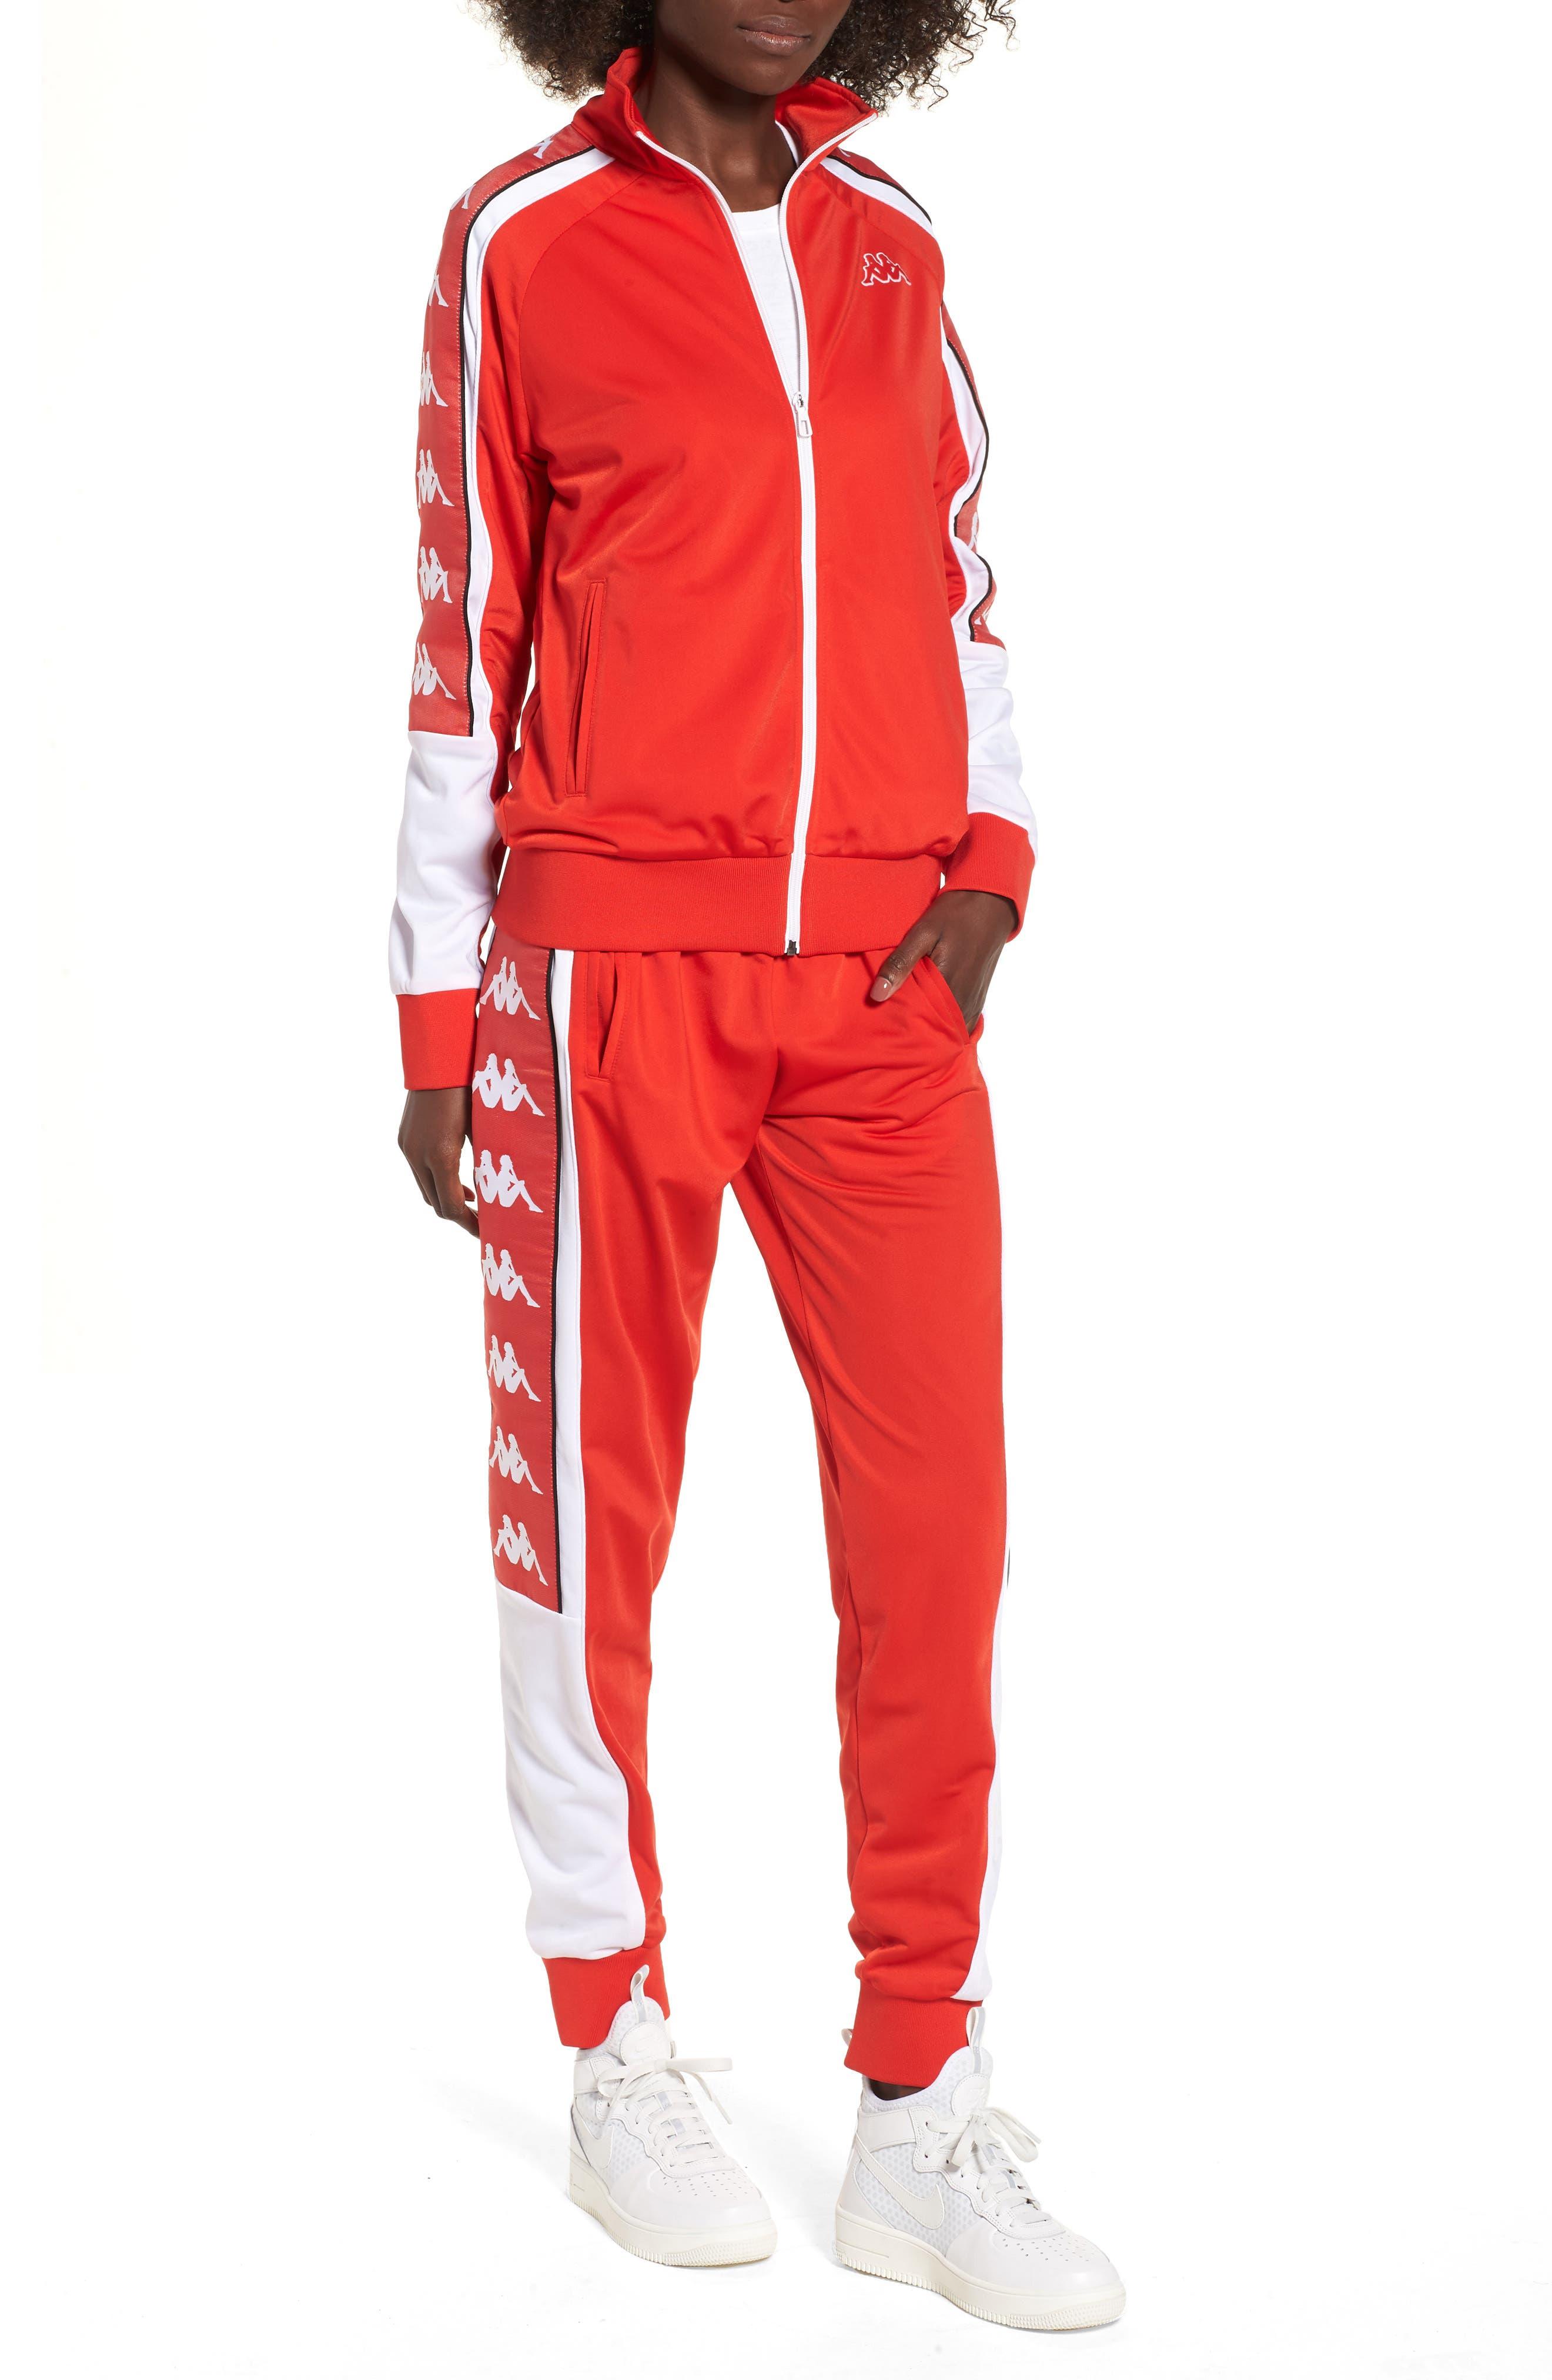 222 Banda 10 Anay Jacket,                             Alternate thumbnail 6, color,                             Red Flame -White